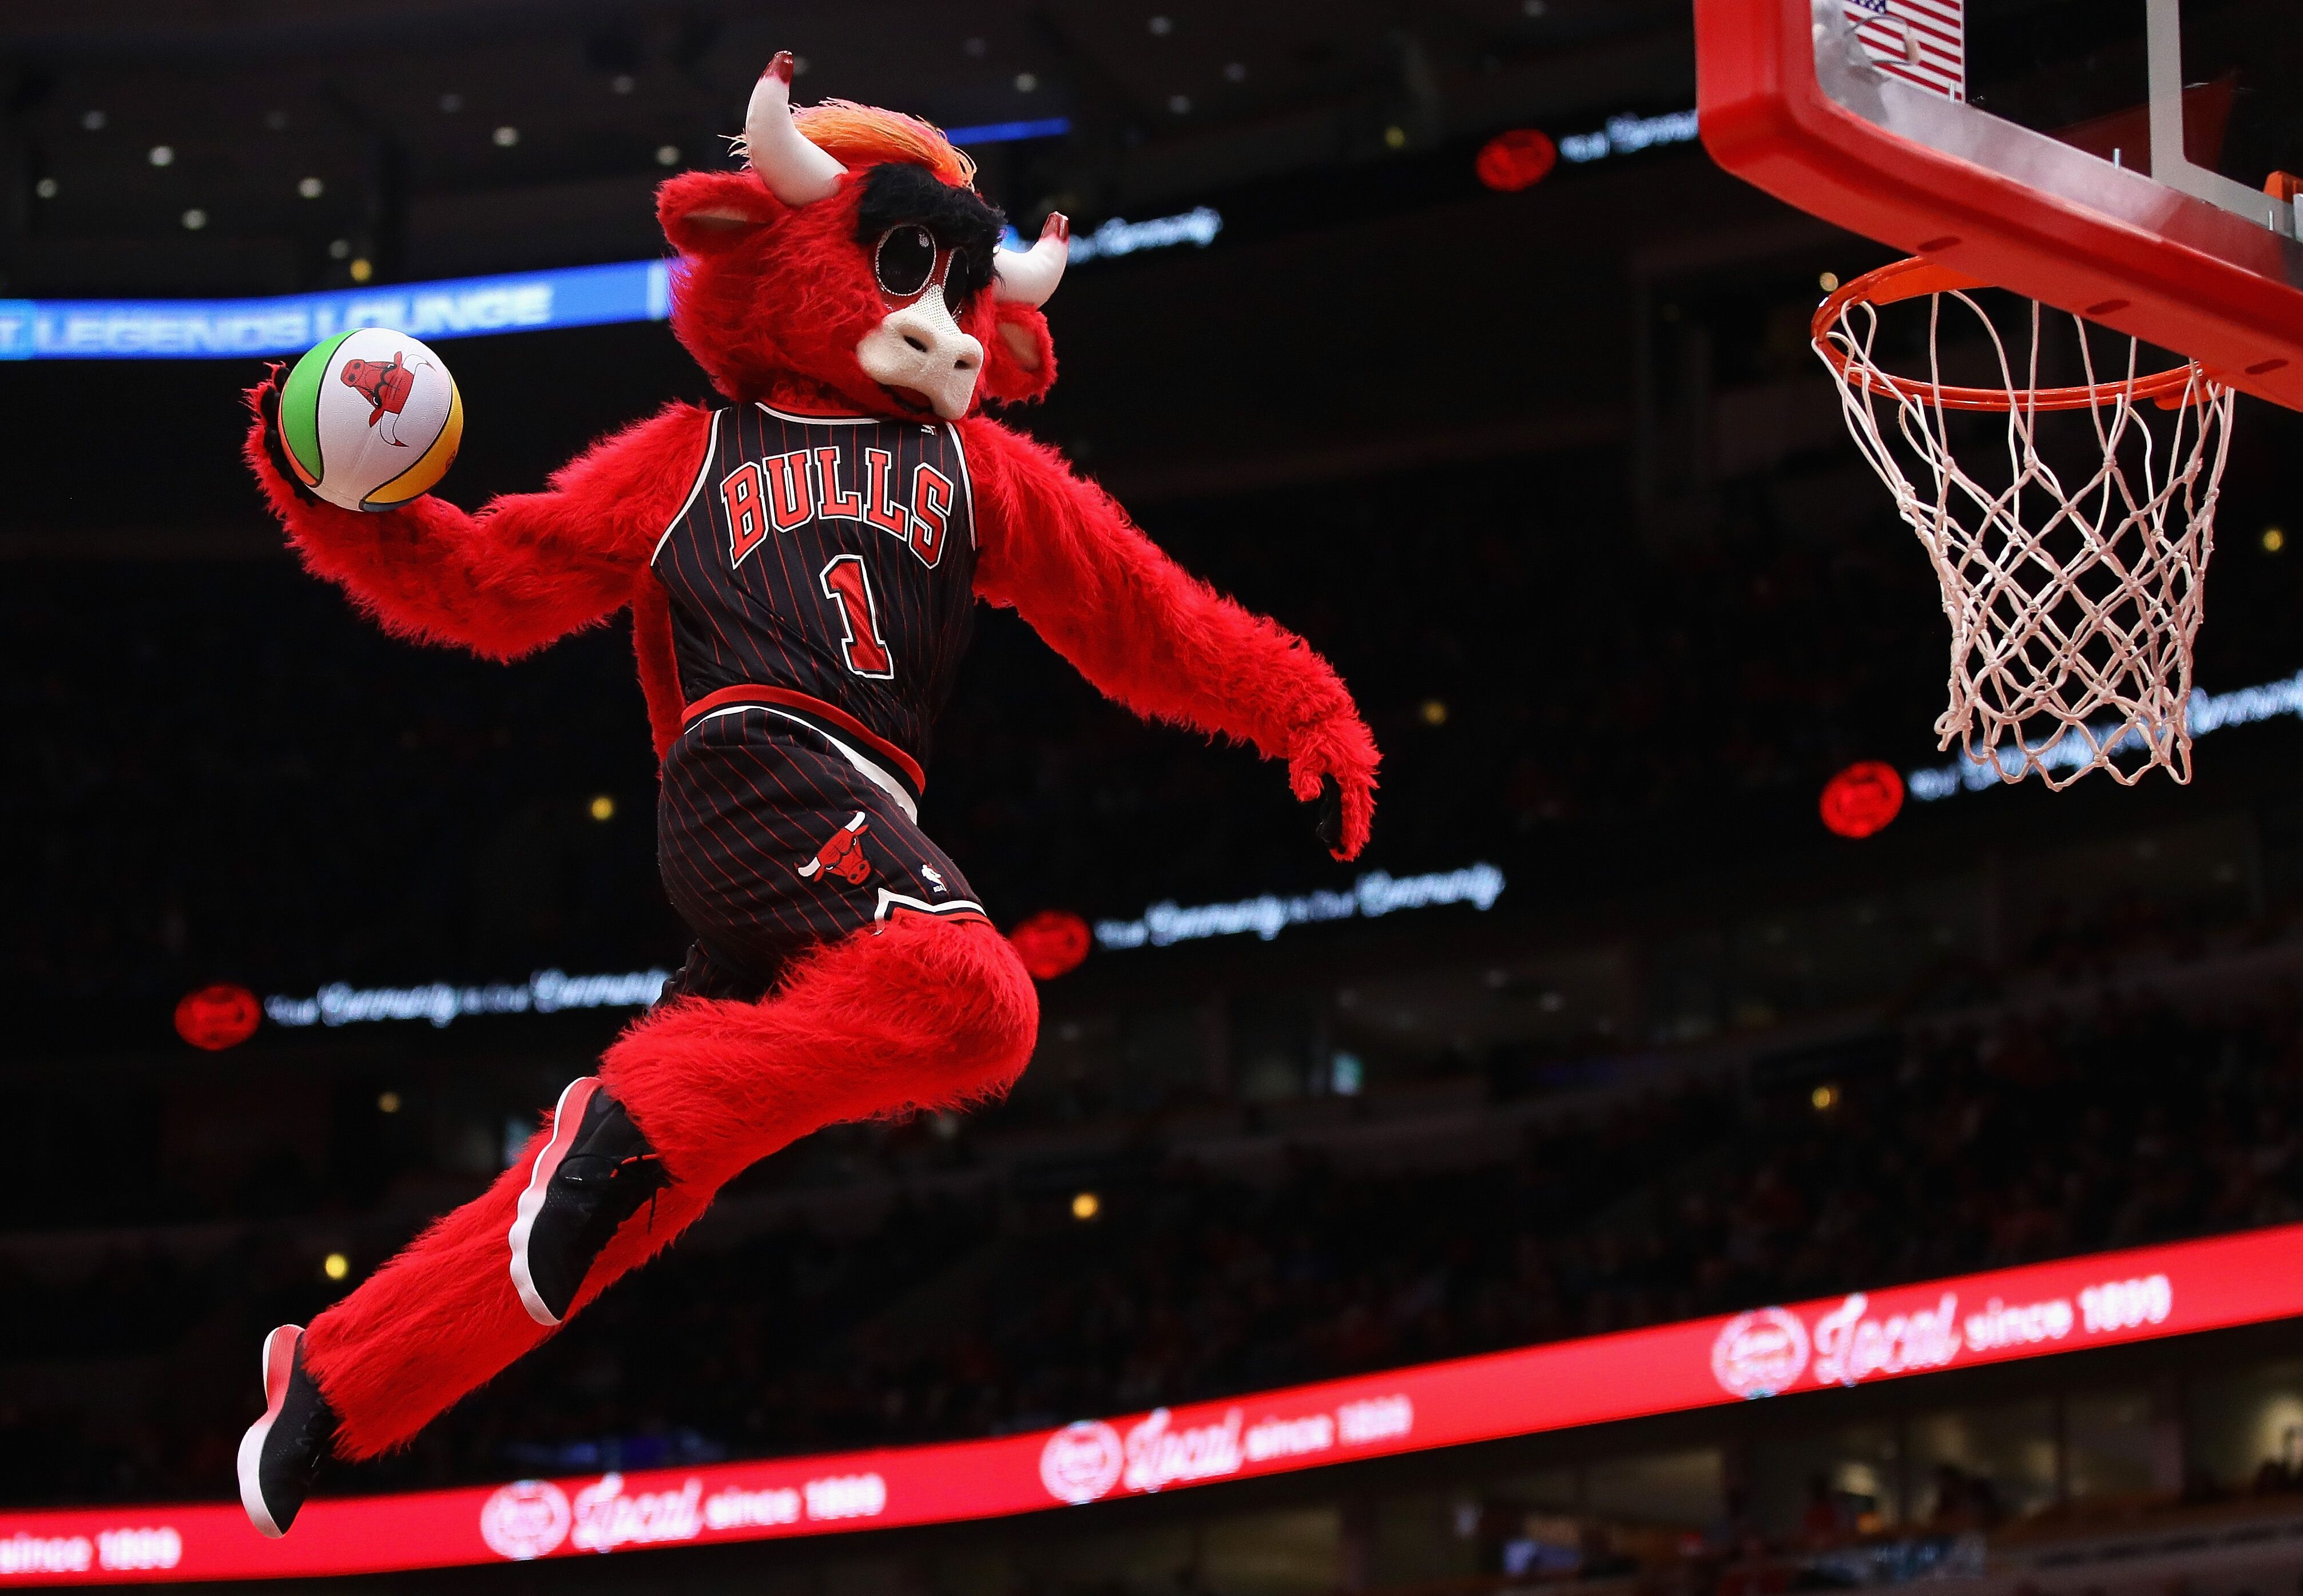 880532510-miami-heat-v-chicago-bulls.jpg